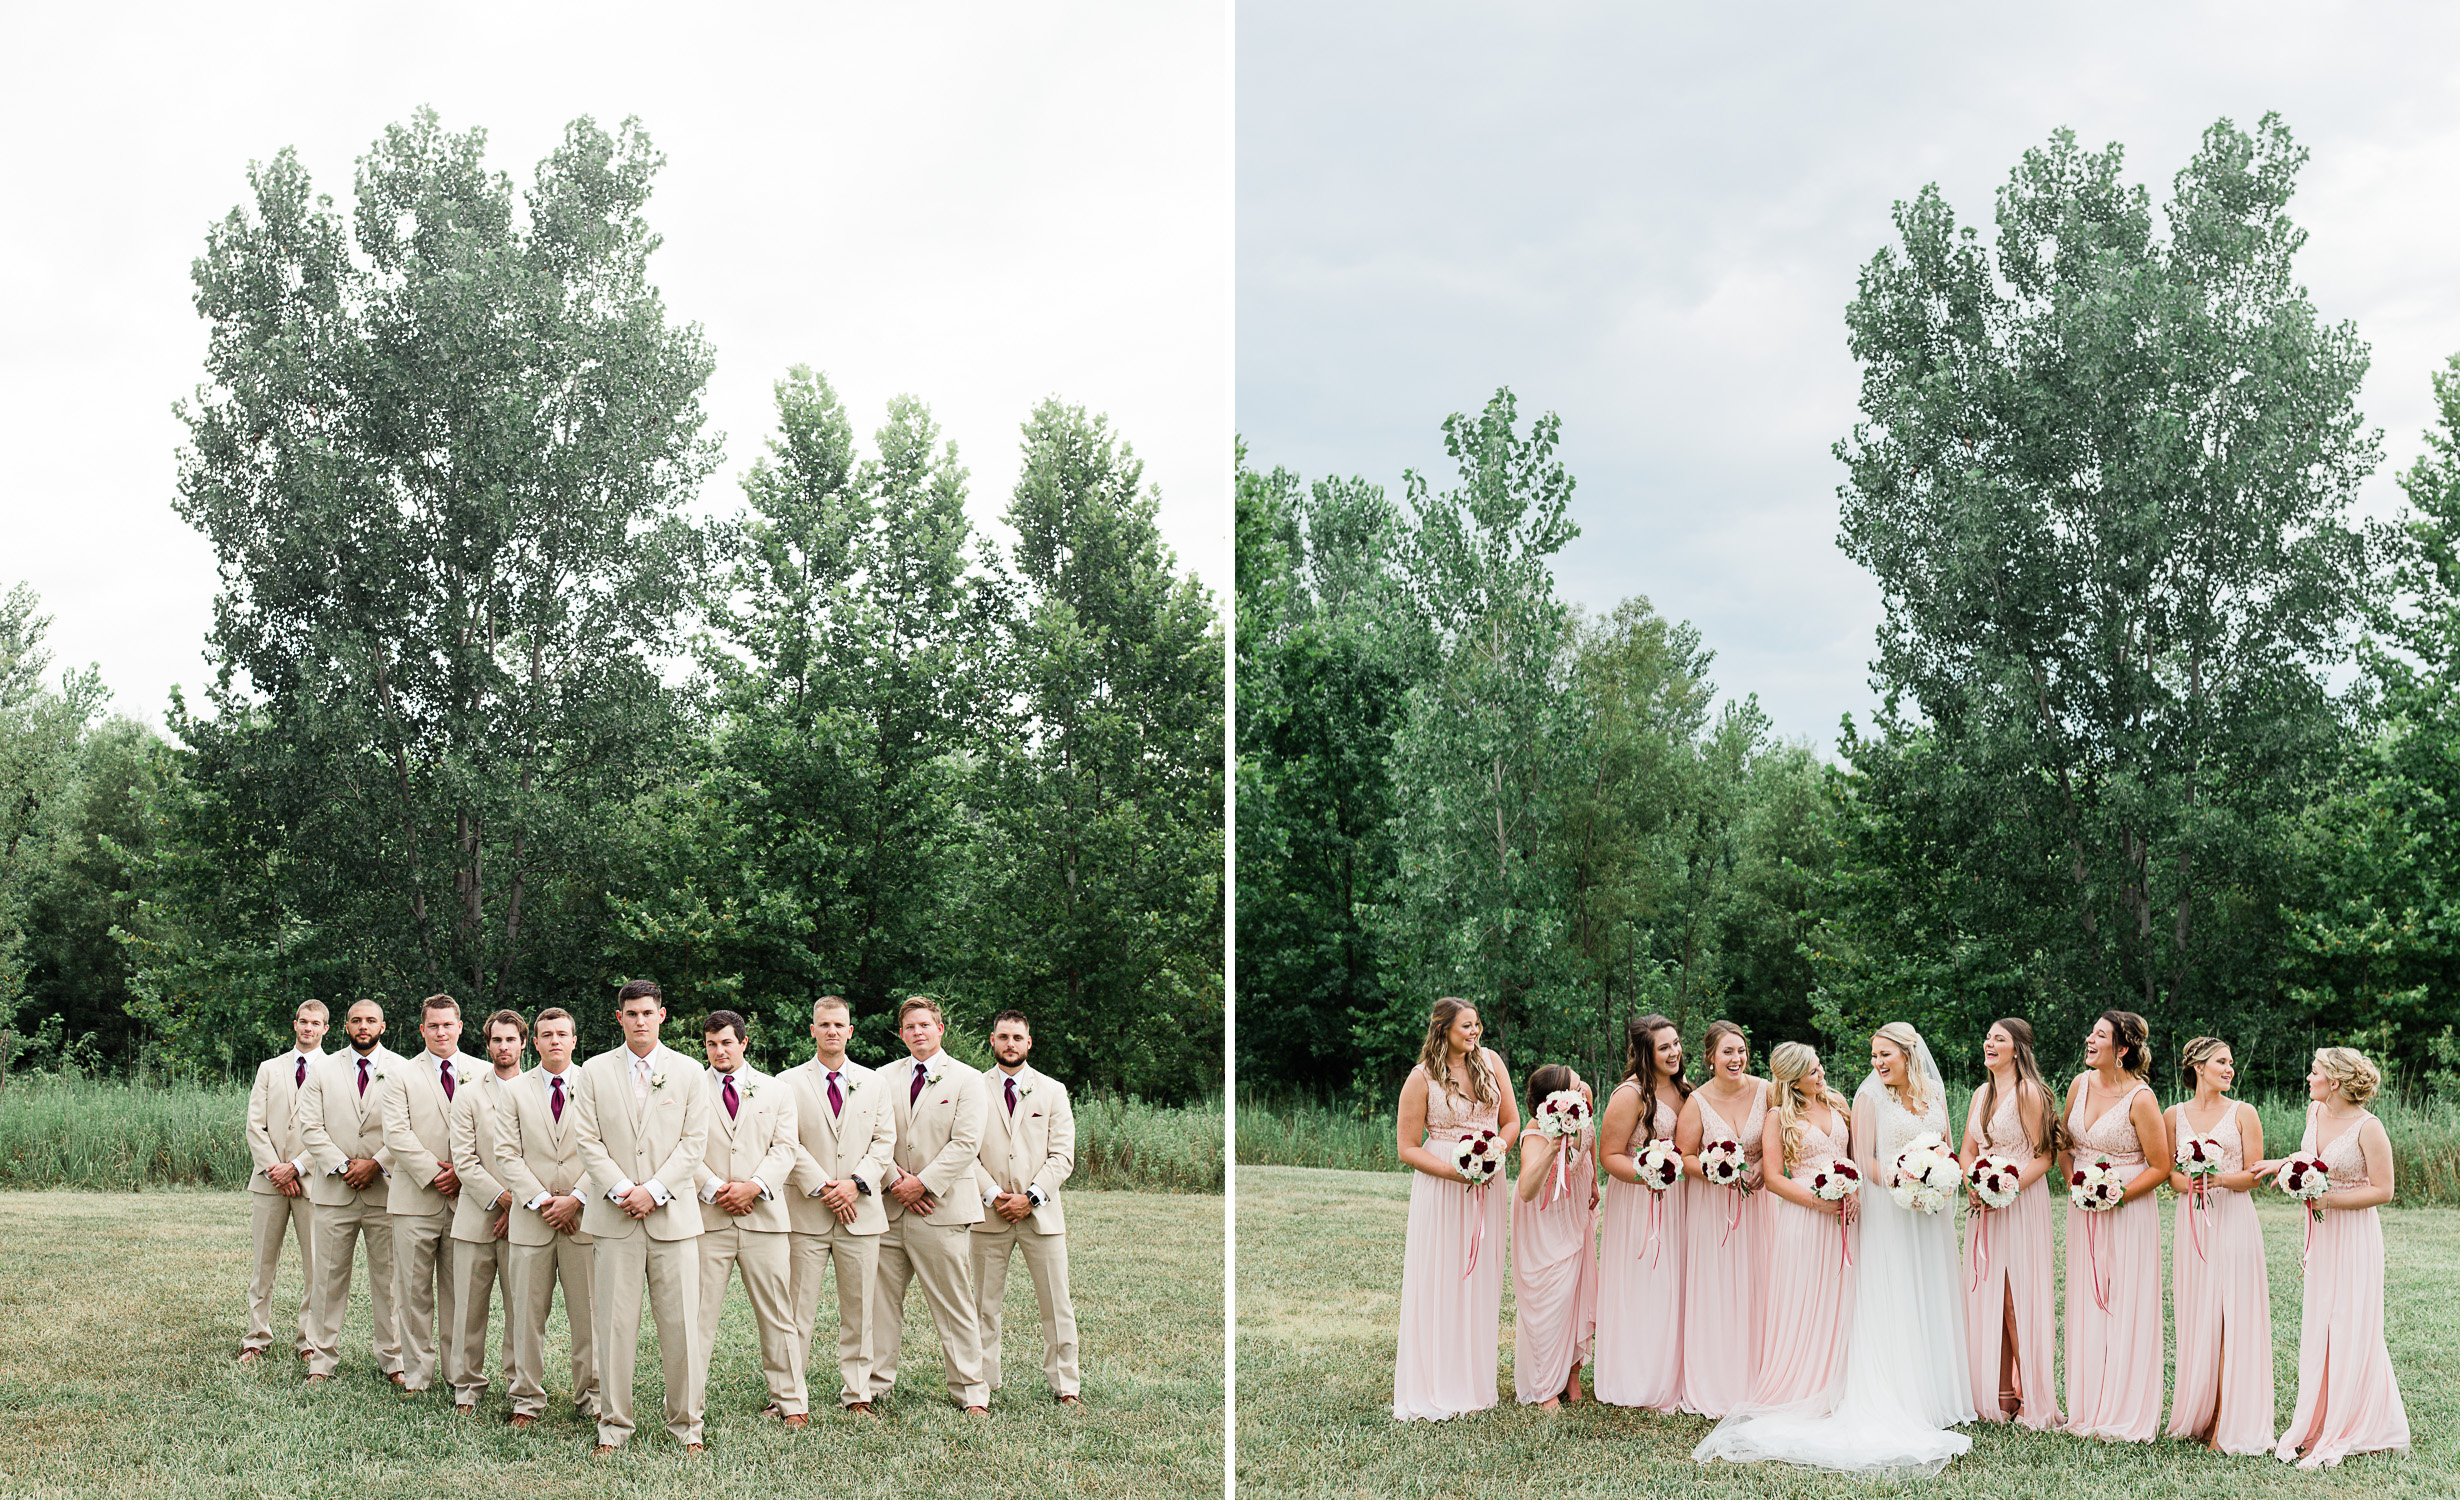 Dorothy_Louise_Photography_Marissa_Jake_Wentzville_MO_Wedding16.jpg